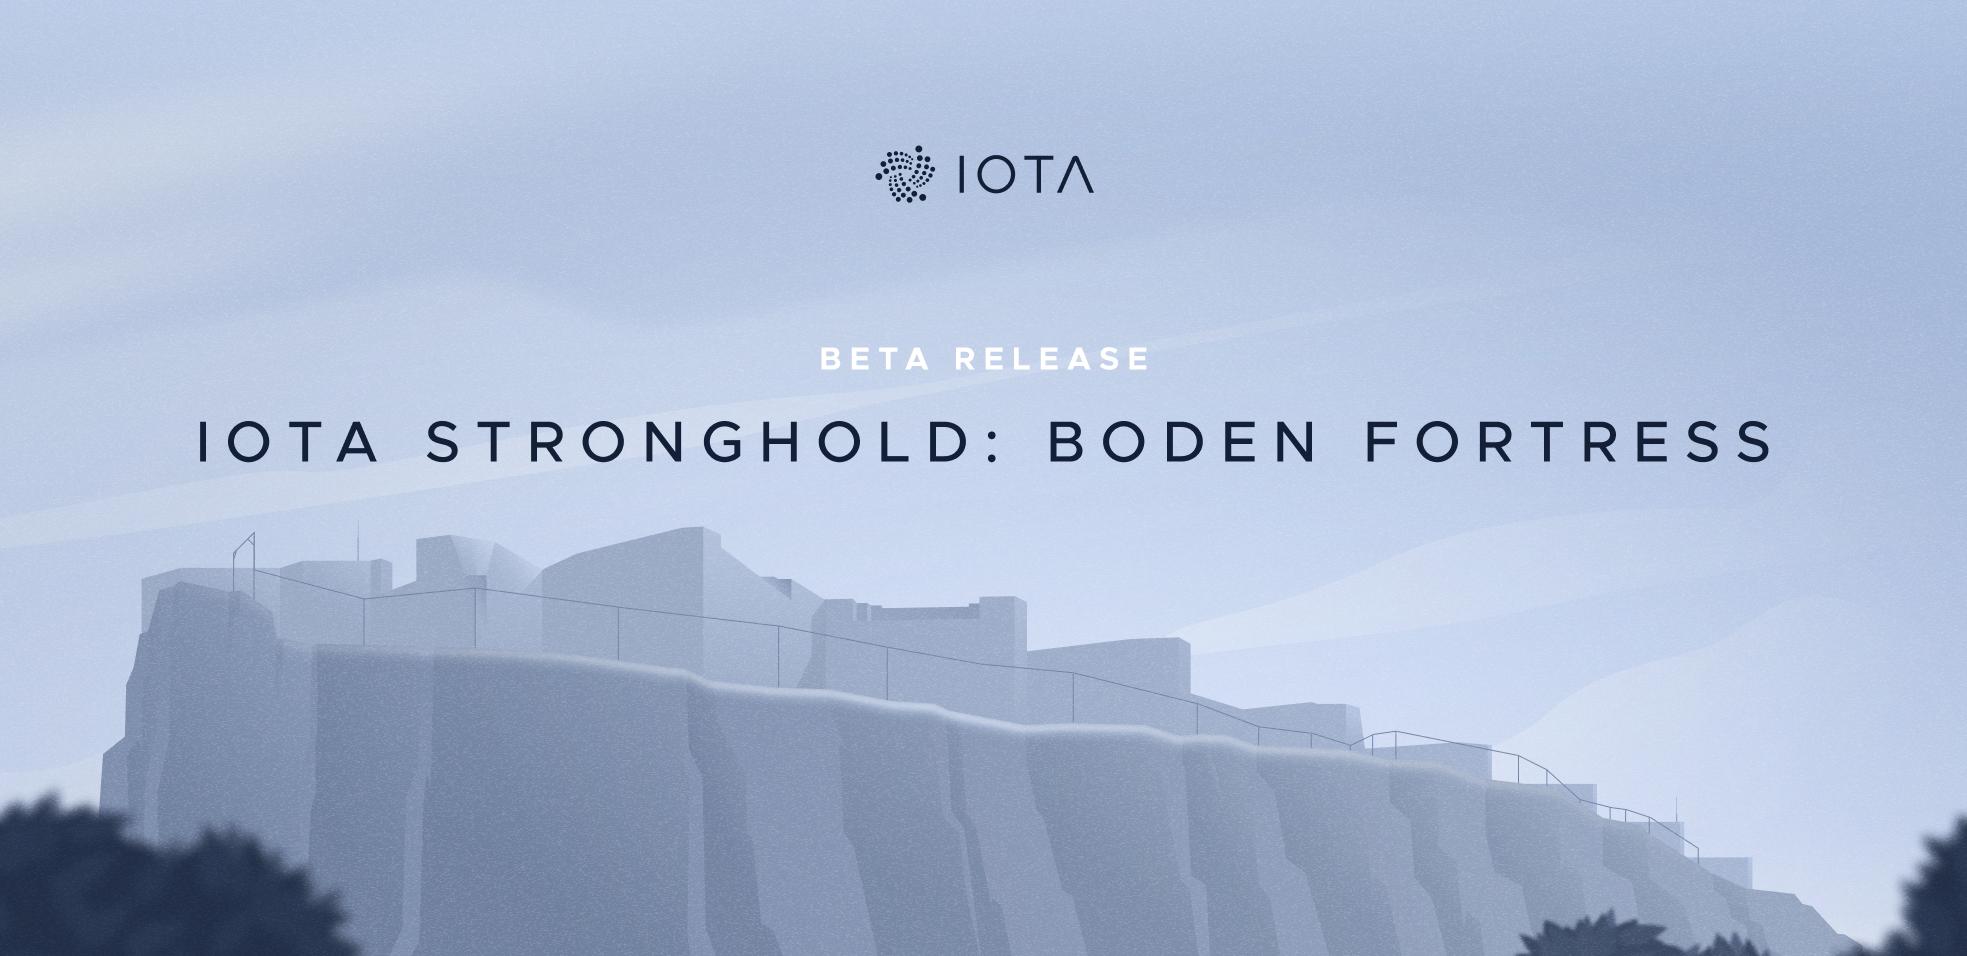 IOTA Stronghold: Beta Release